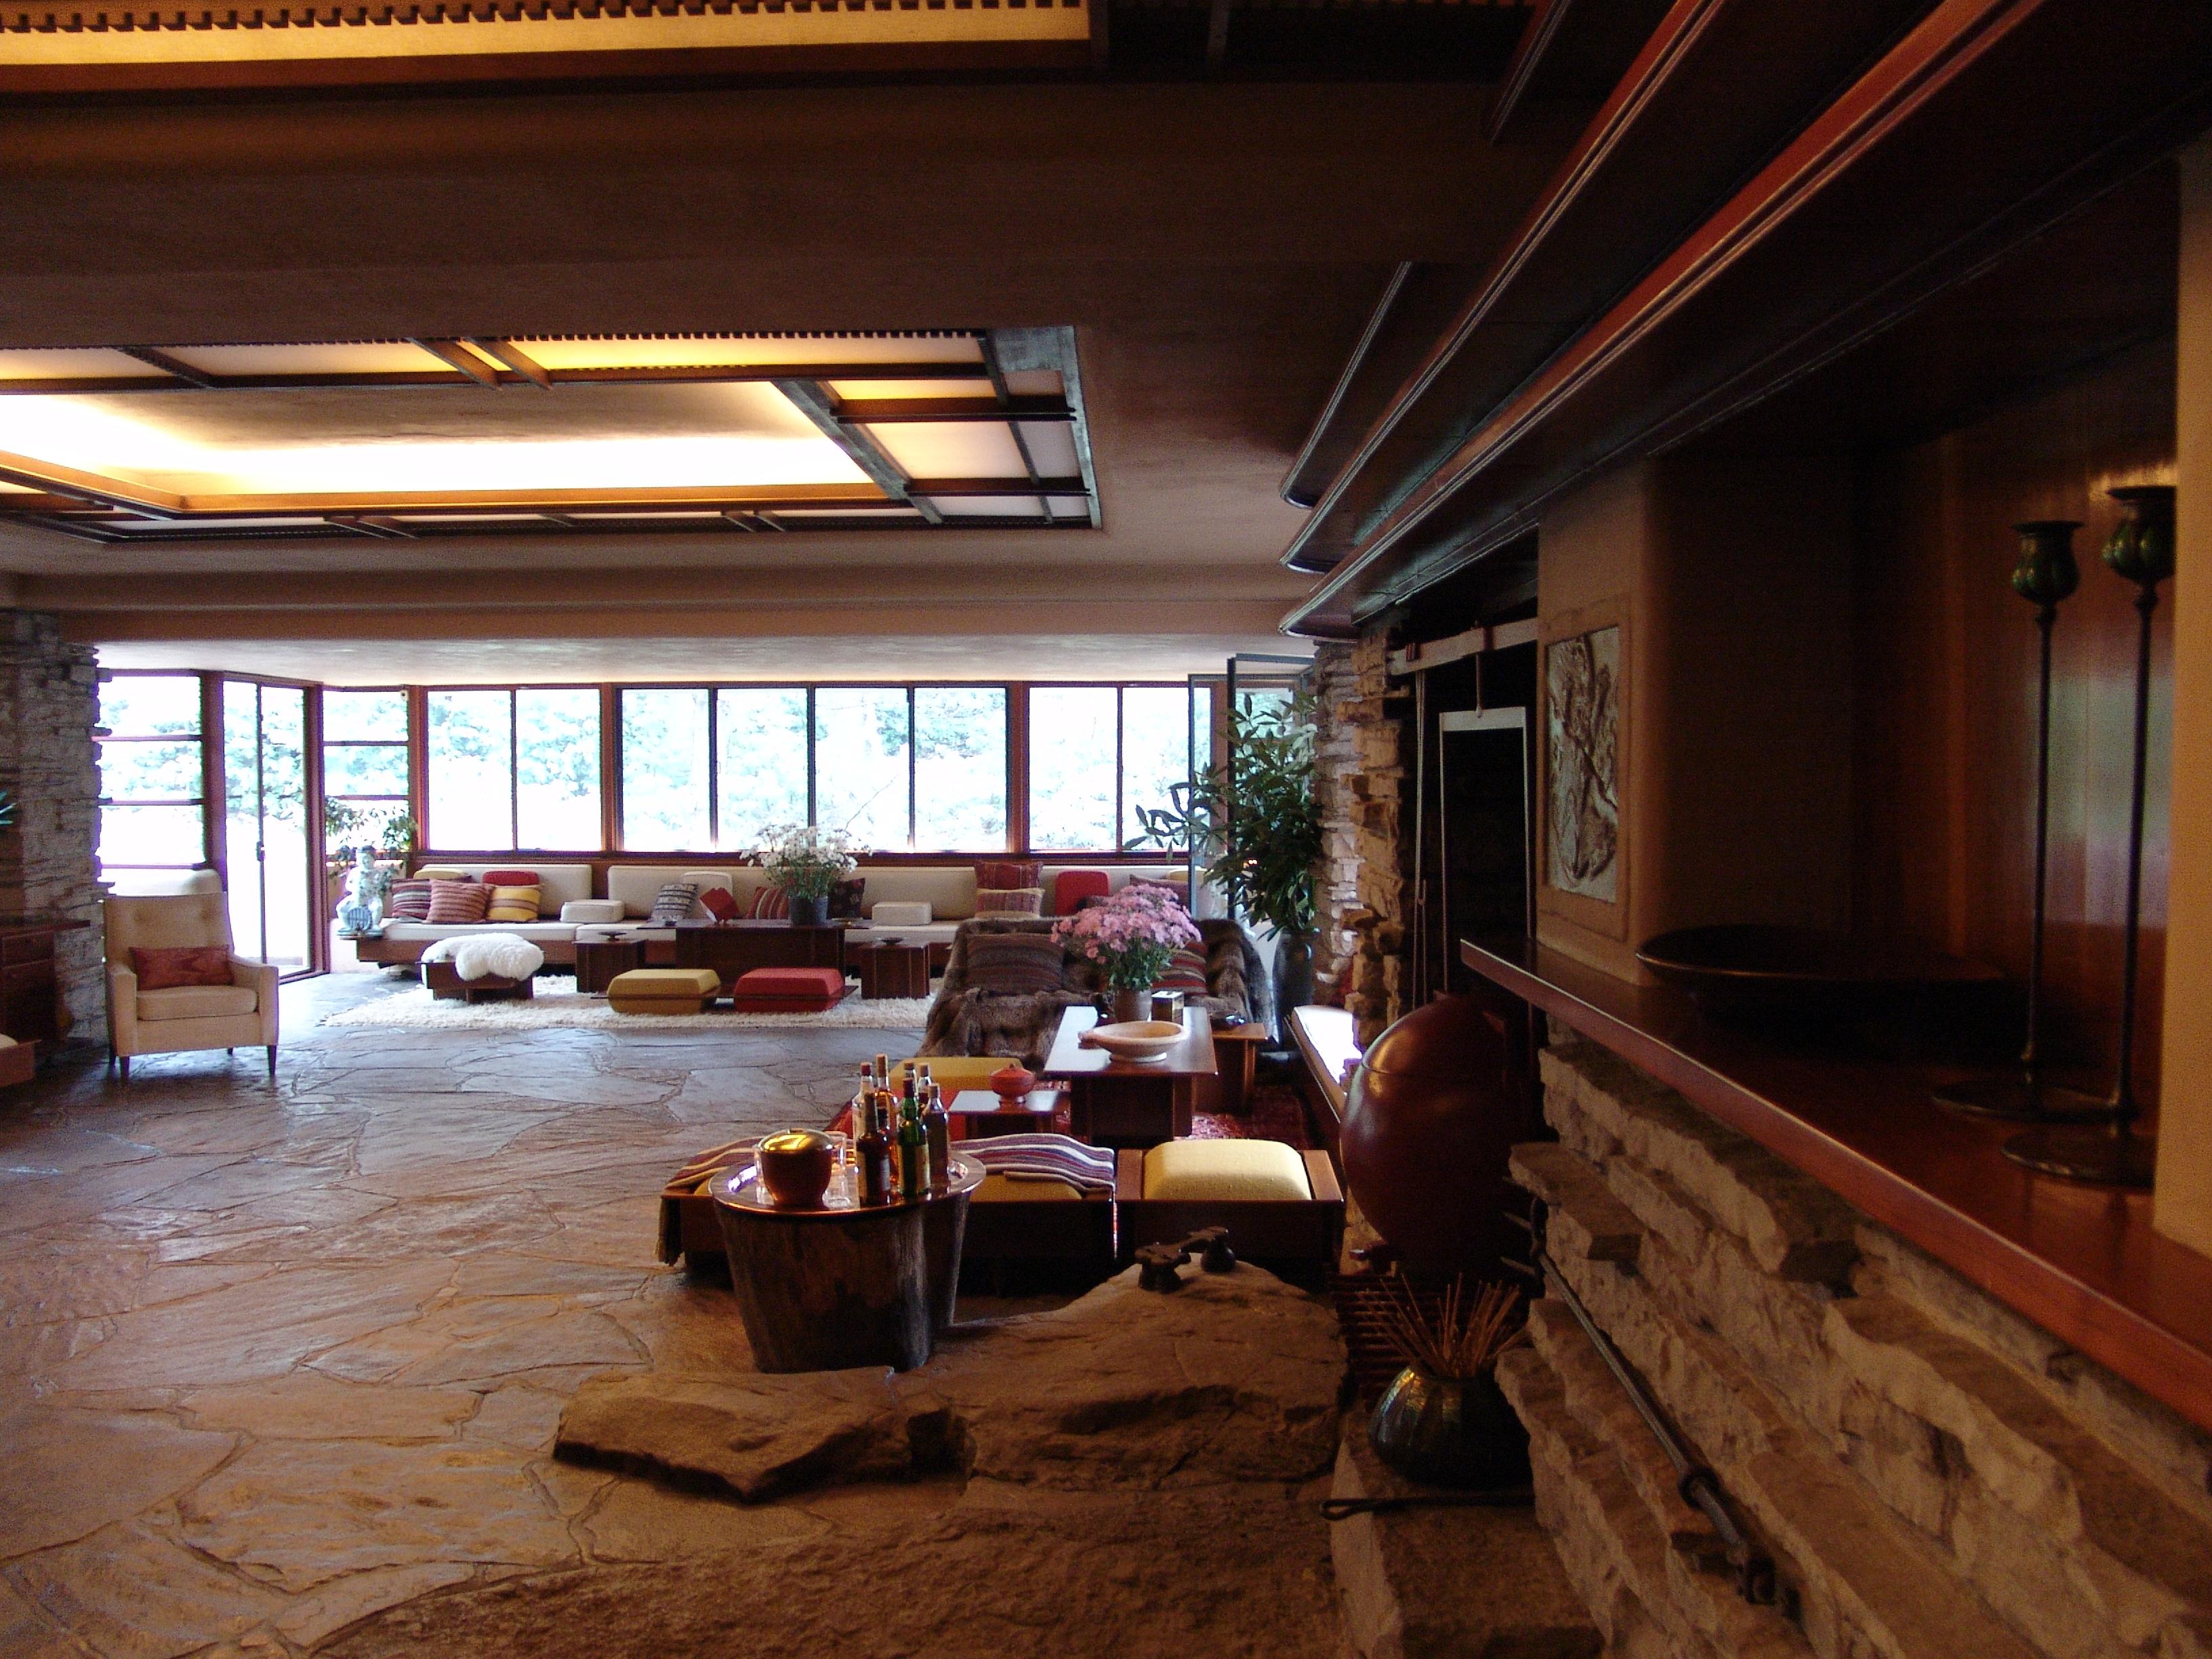 File:Frank Lloyd Wright - Fallingwater interior 7.JPG